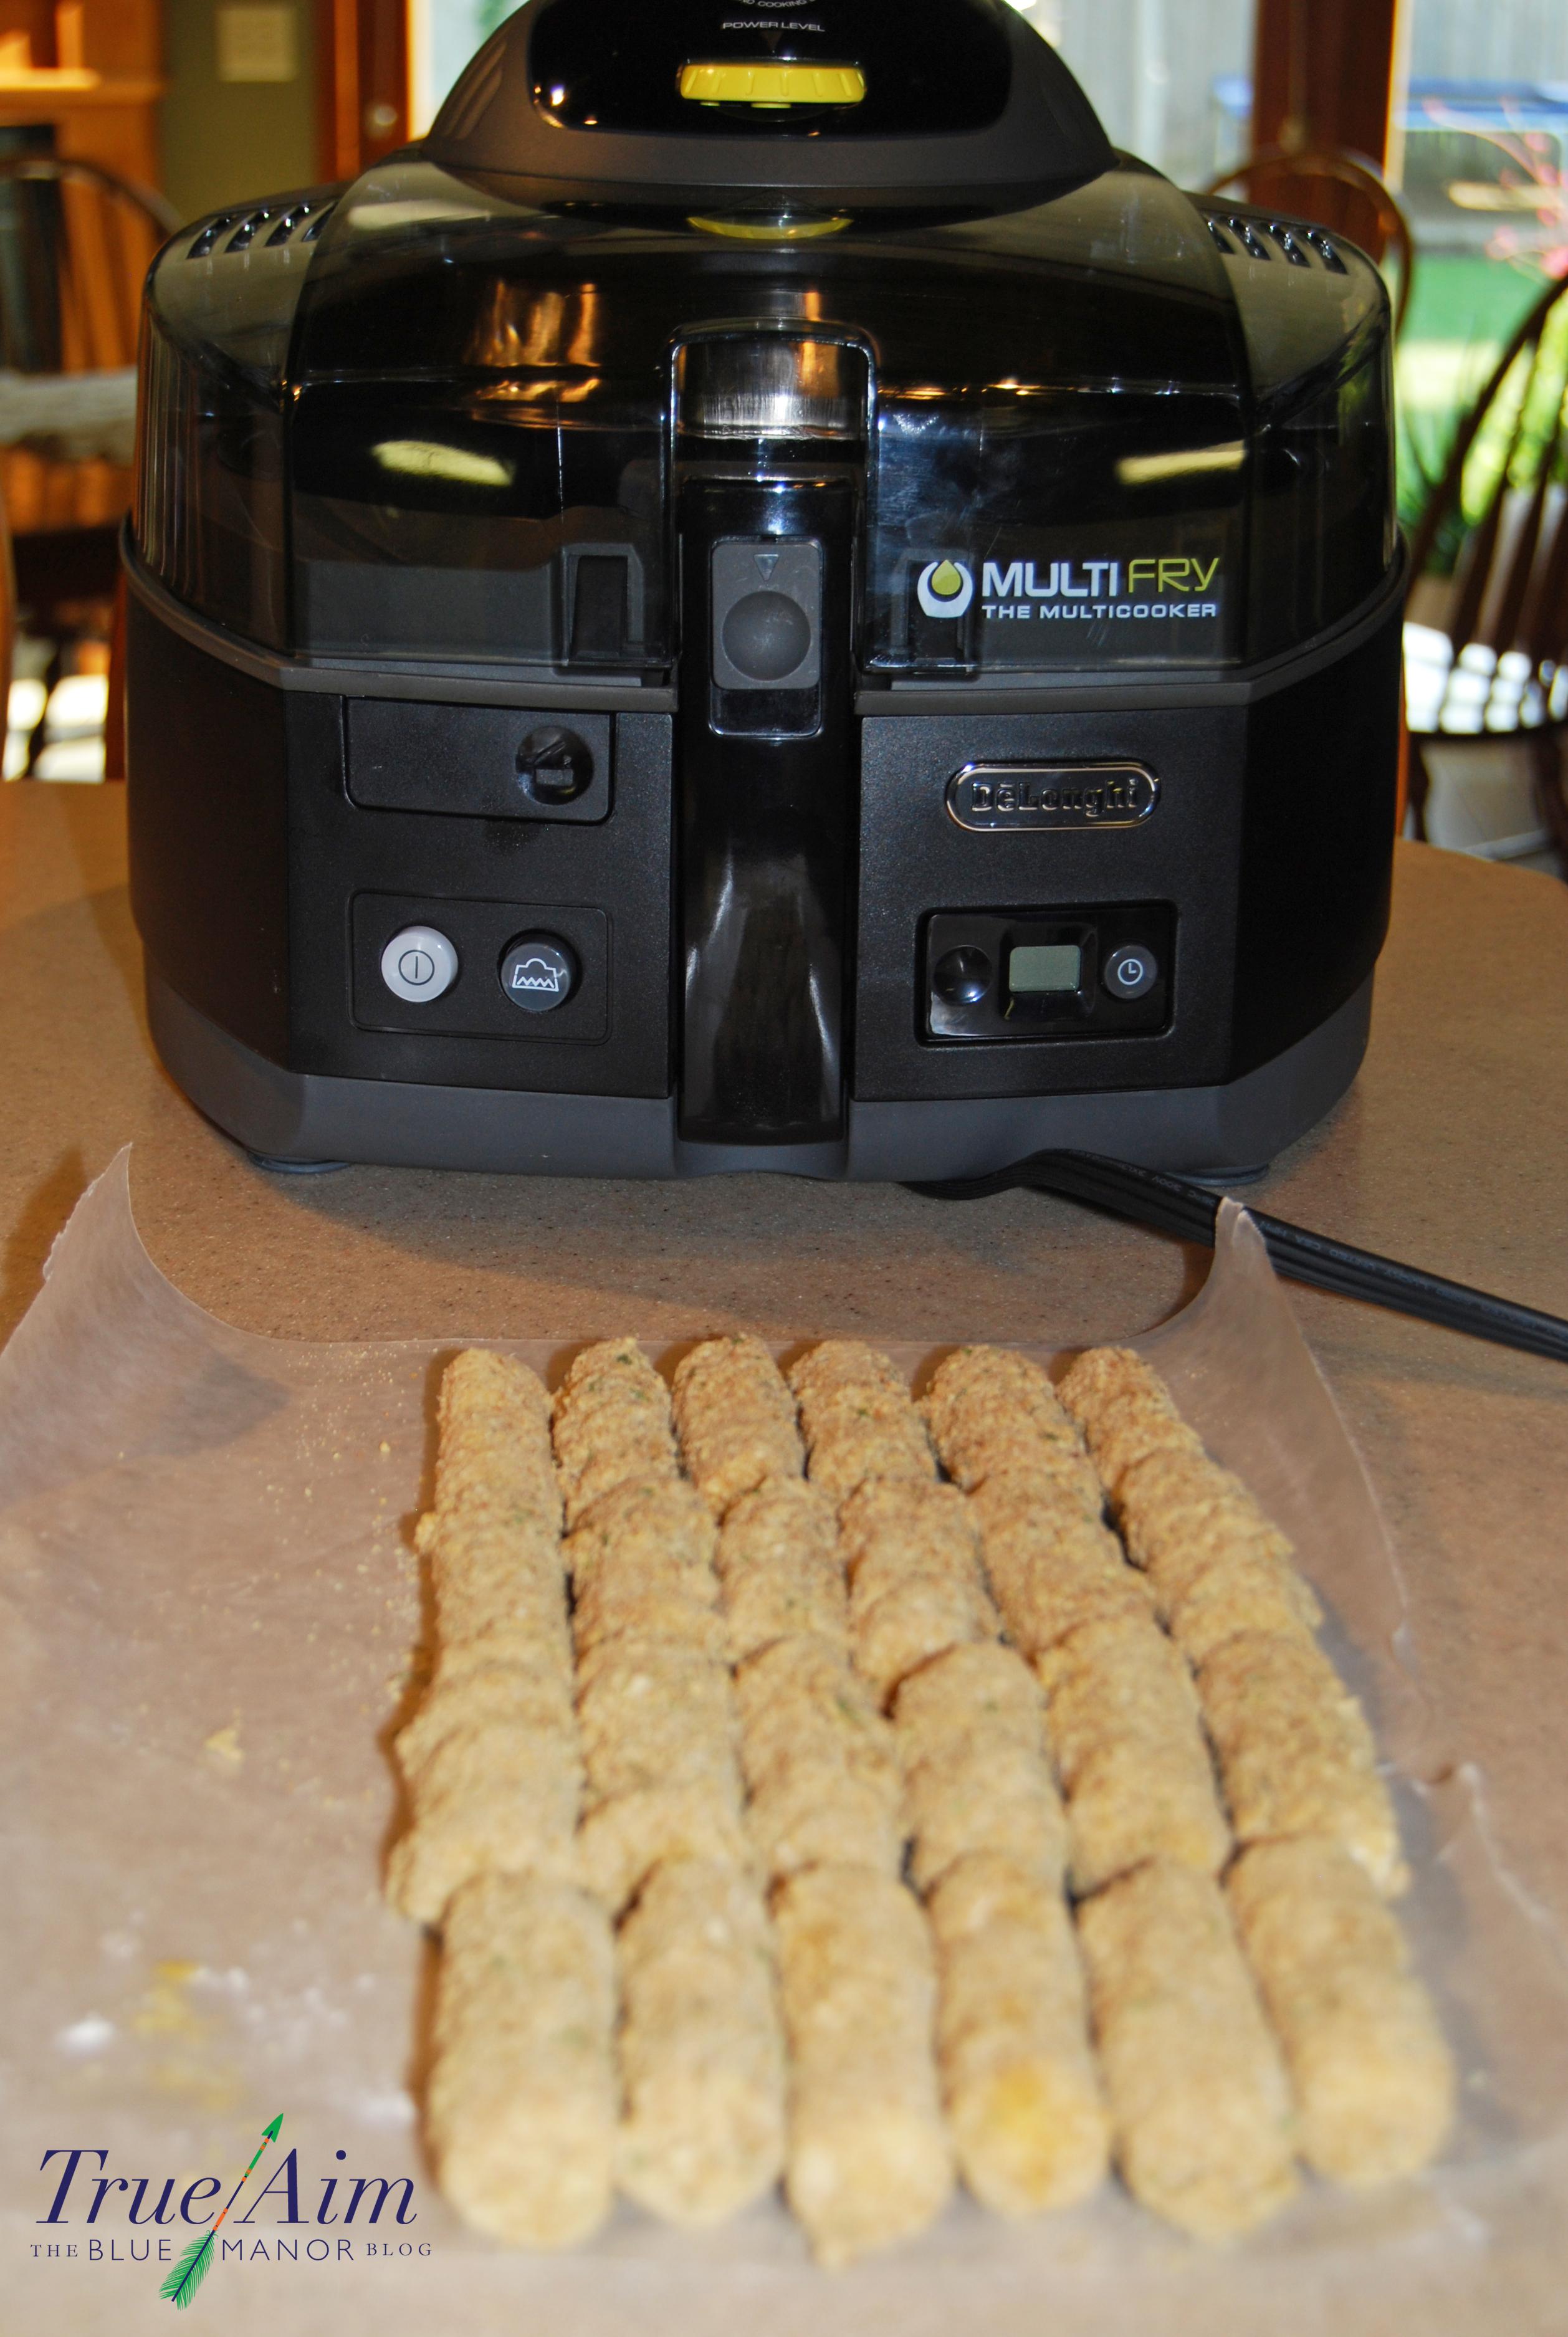 Easy Mozzarella Sticks with multifry